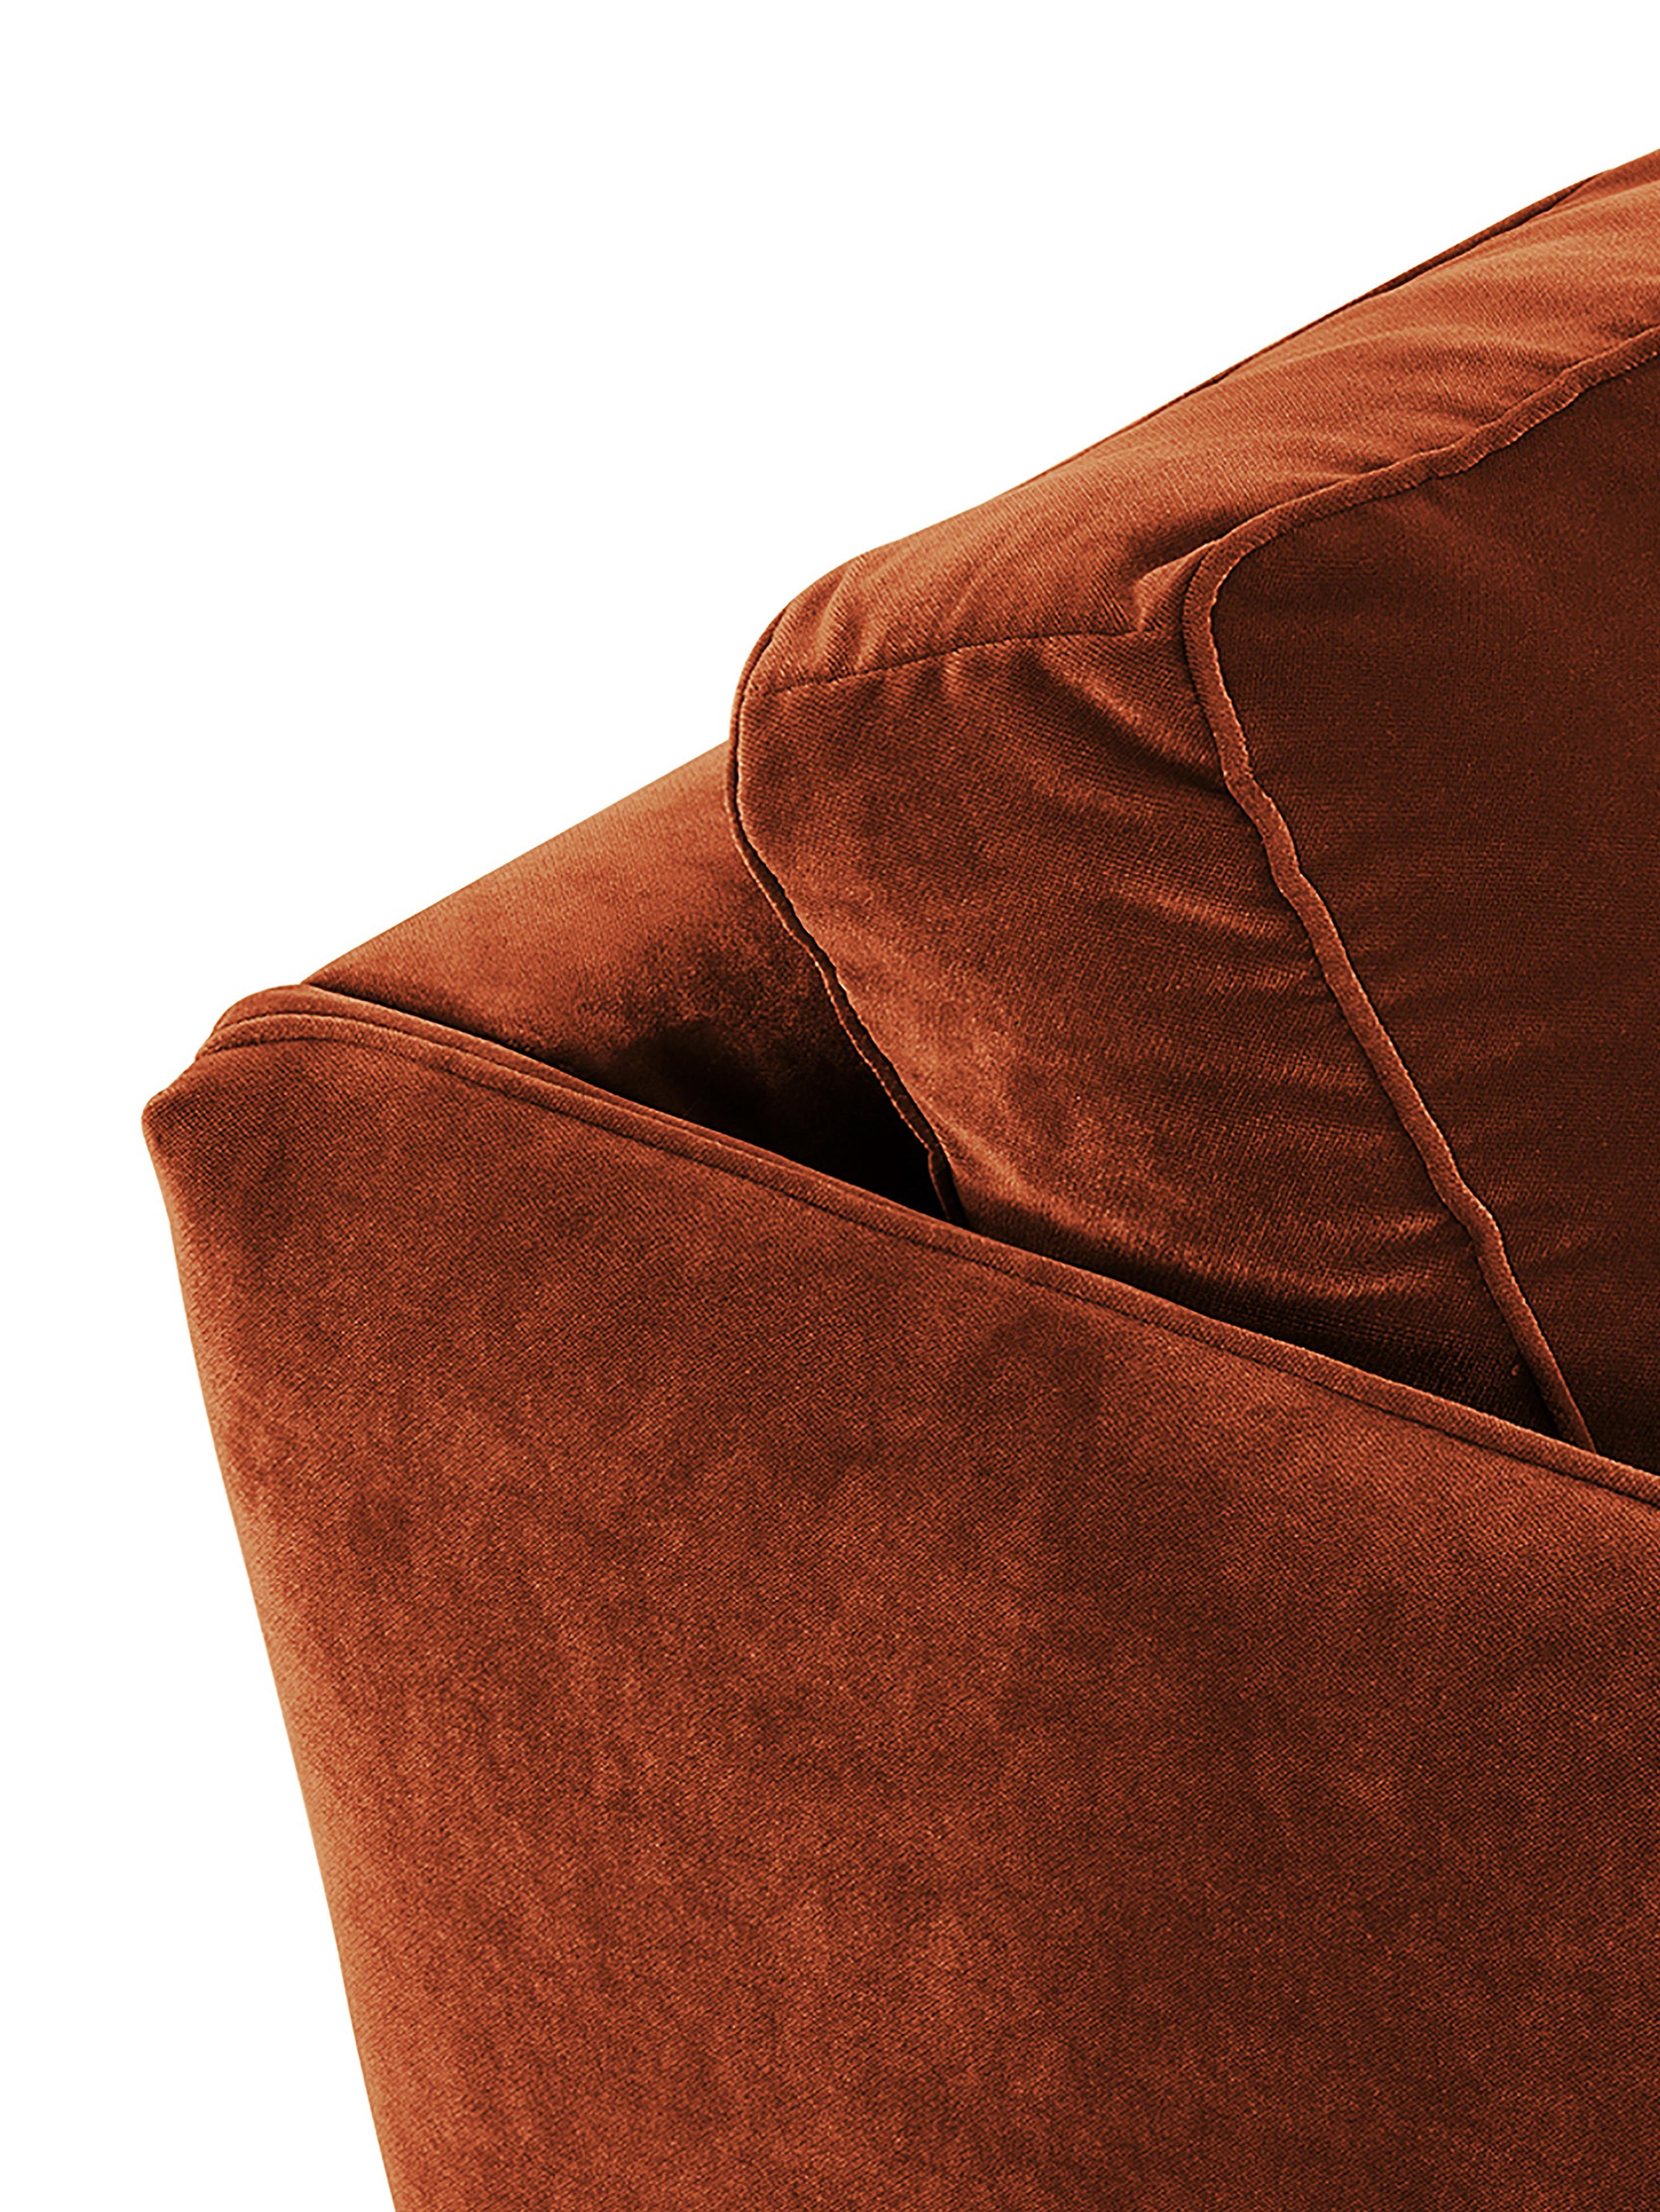 Samt-Sofa Paola (3-Sitzer), Bezug: Samt (Polyester) 70.000 S, Gestell: Massives Fichtenholz, Spa, Füße: Fichtenholz, lackiert, Samt Rostrot, 209 x 86 cm